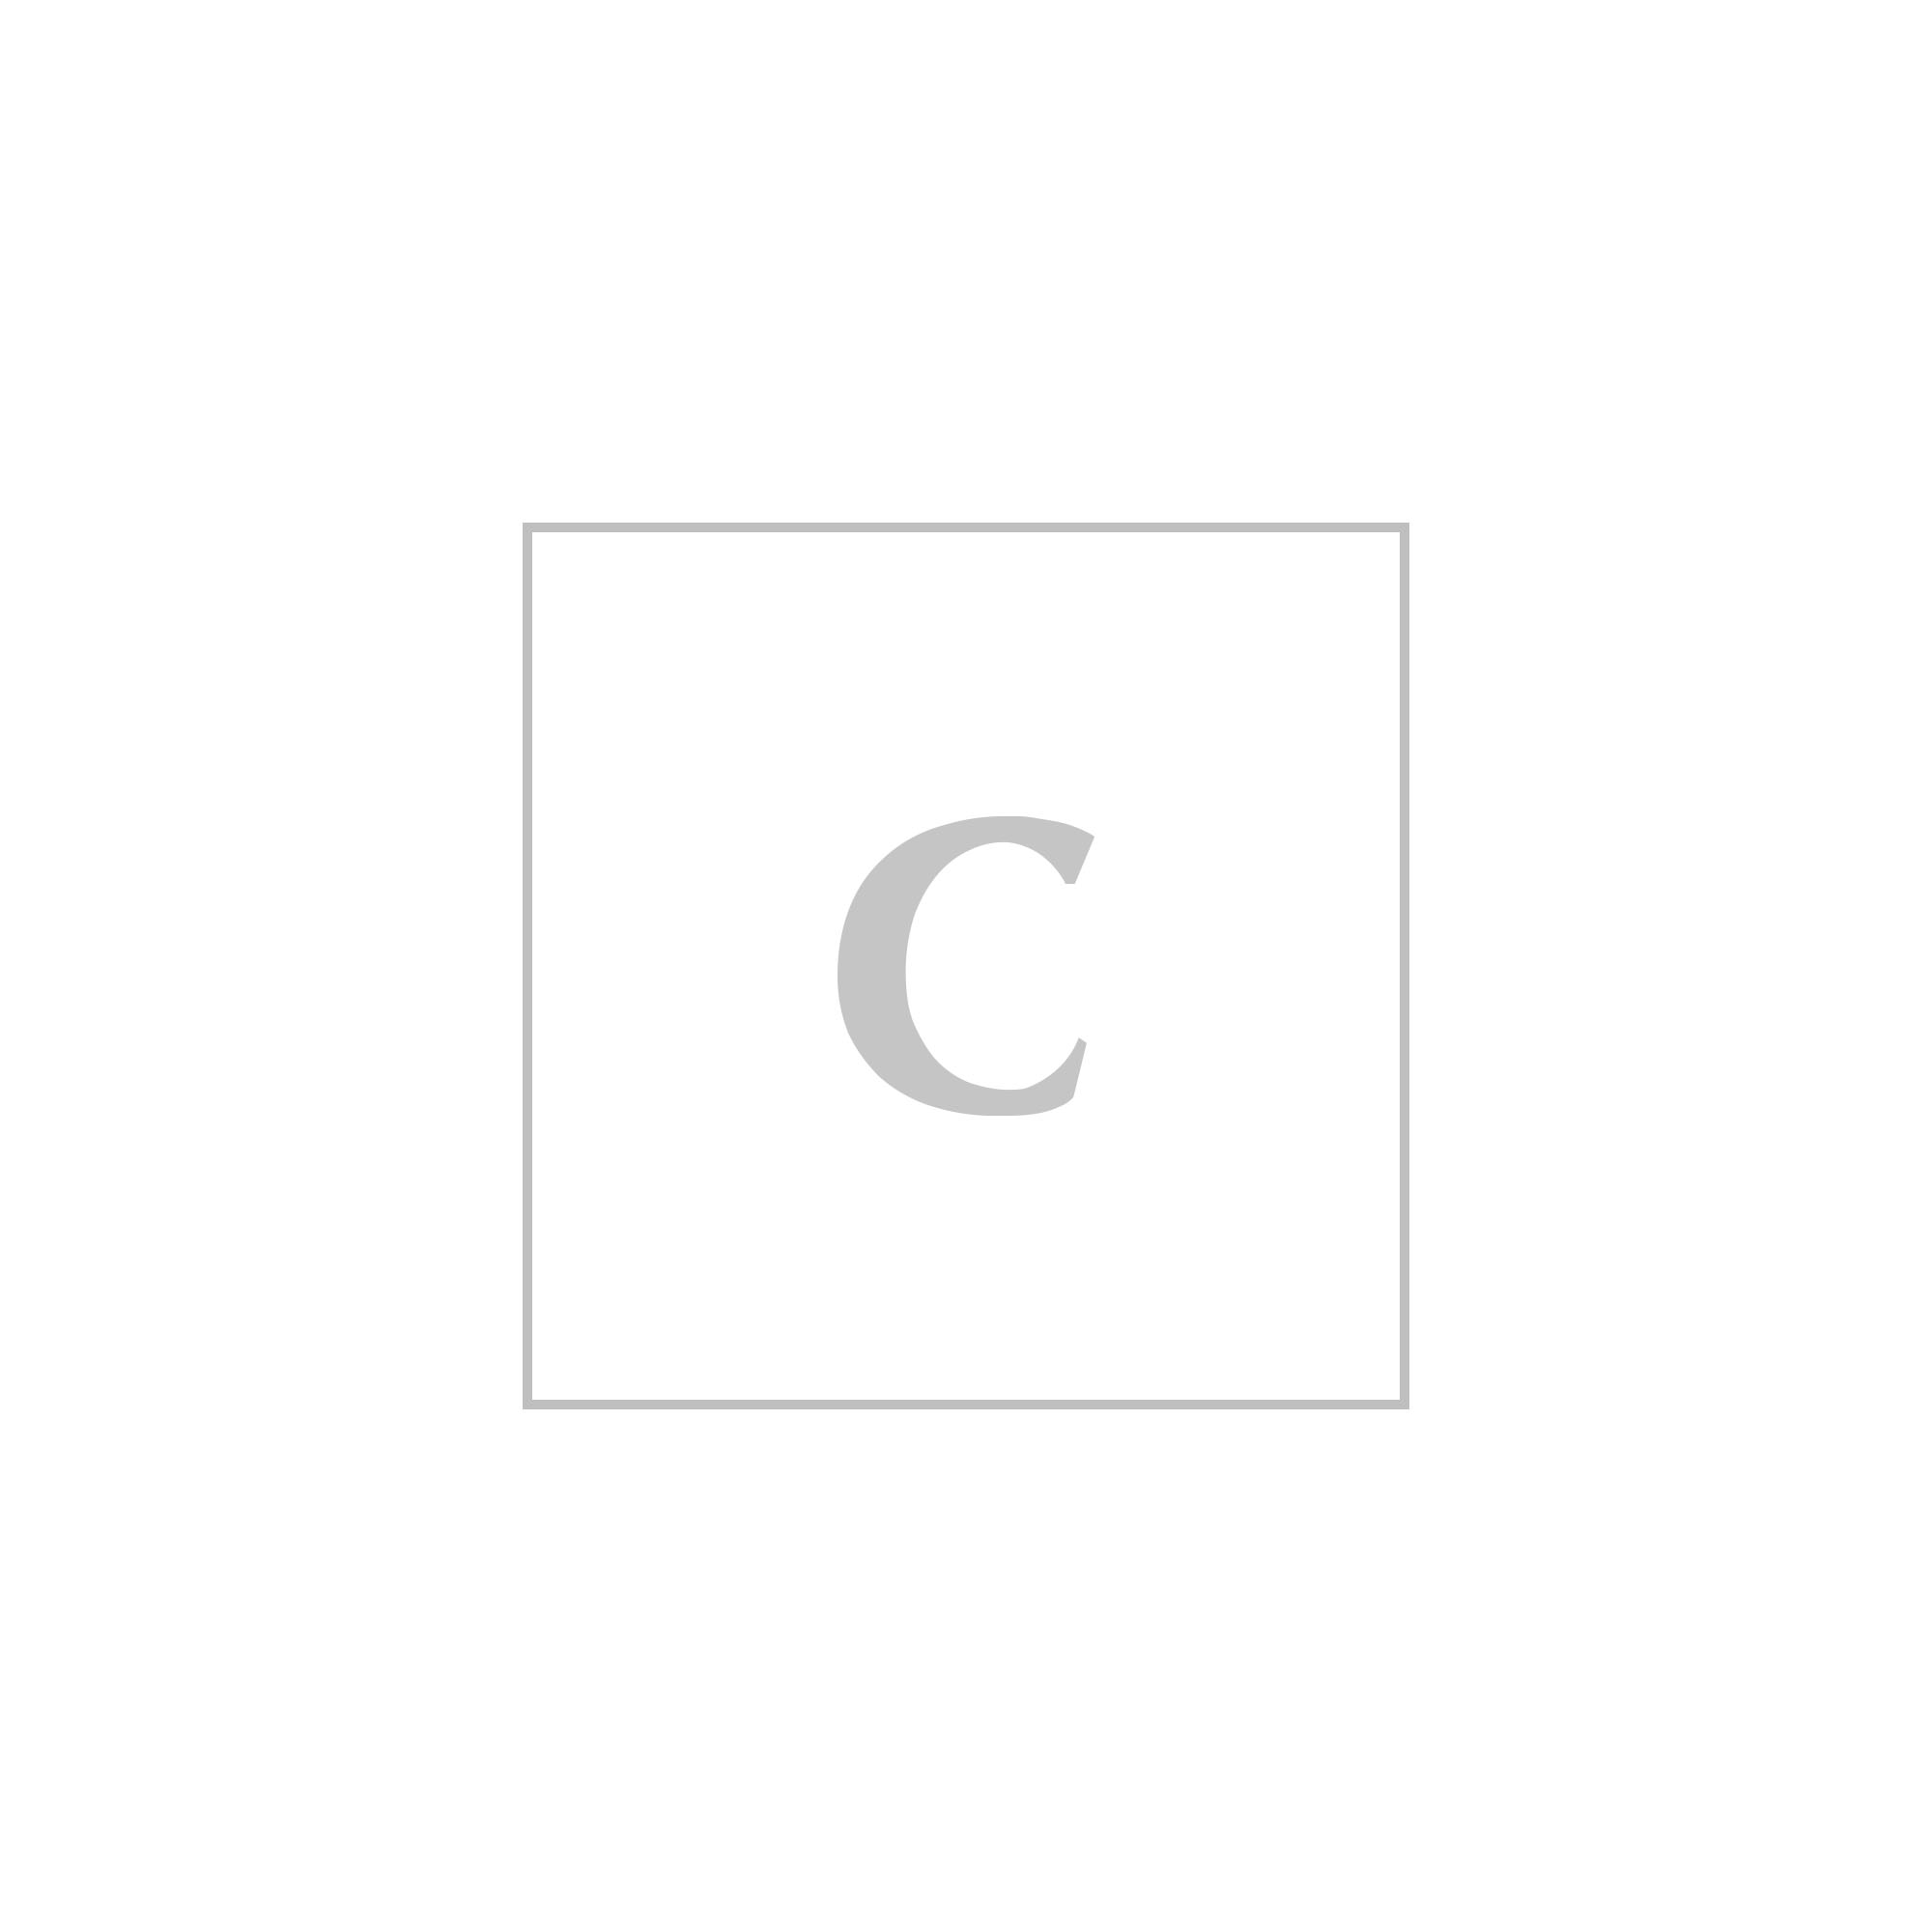 Dolce & gabbana mini phone case crespo leo